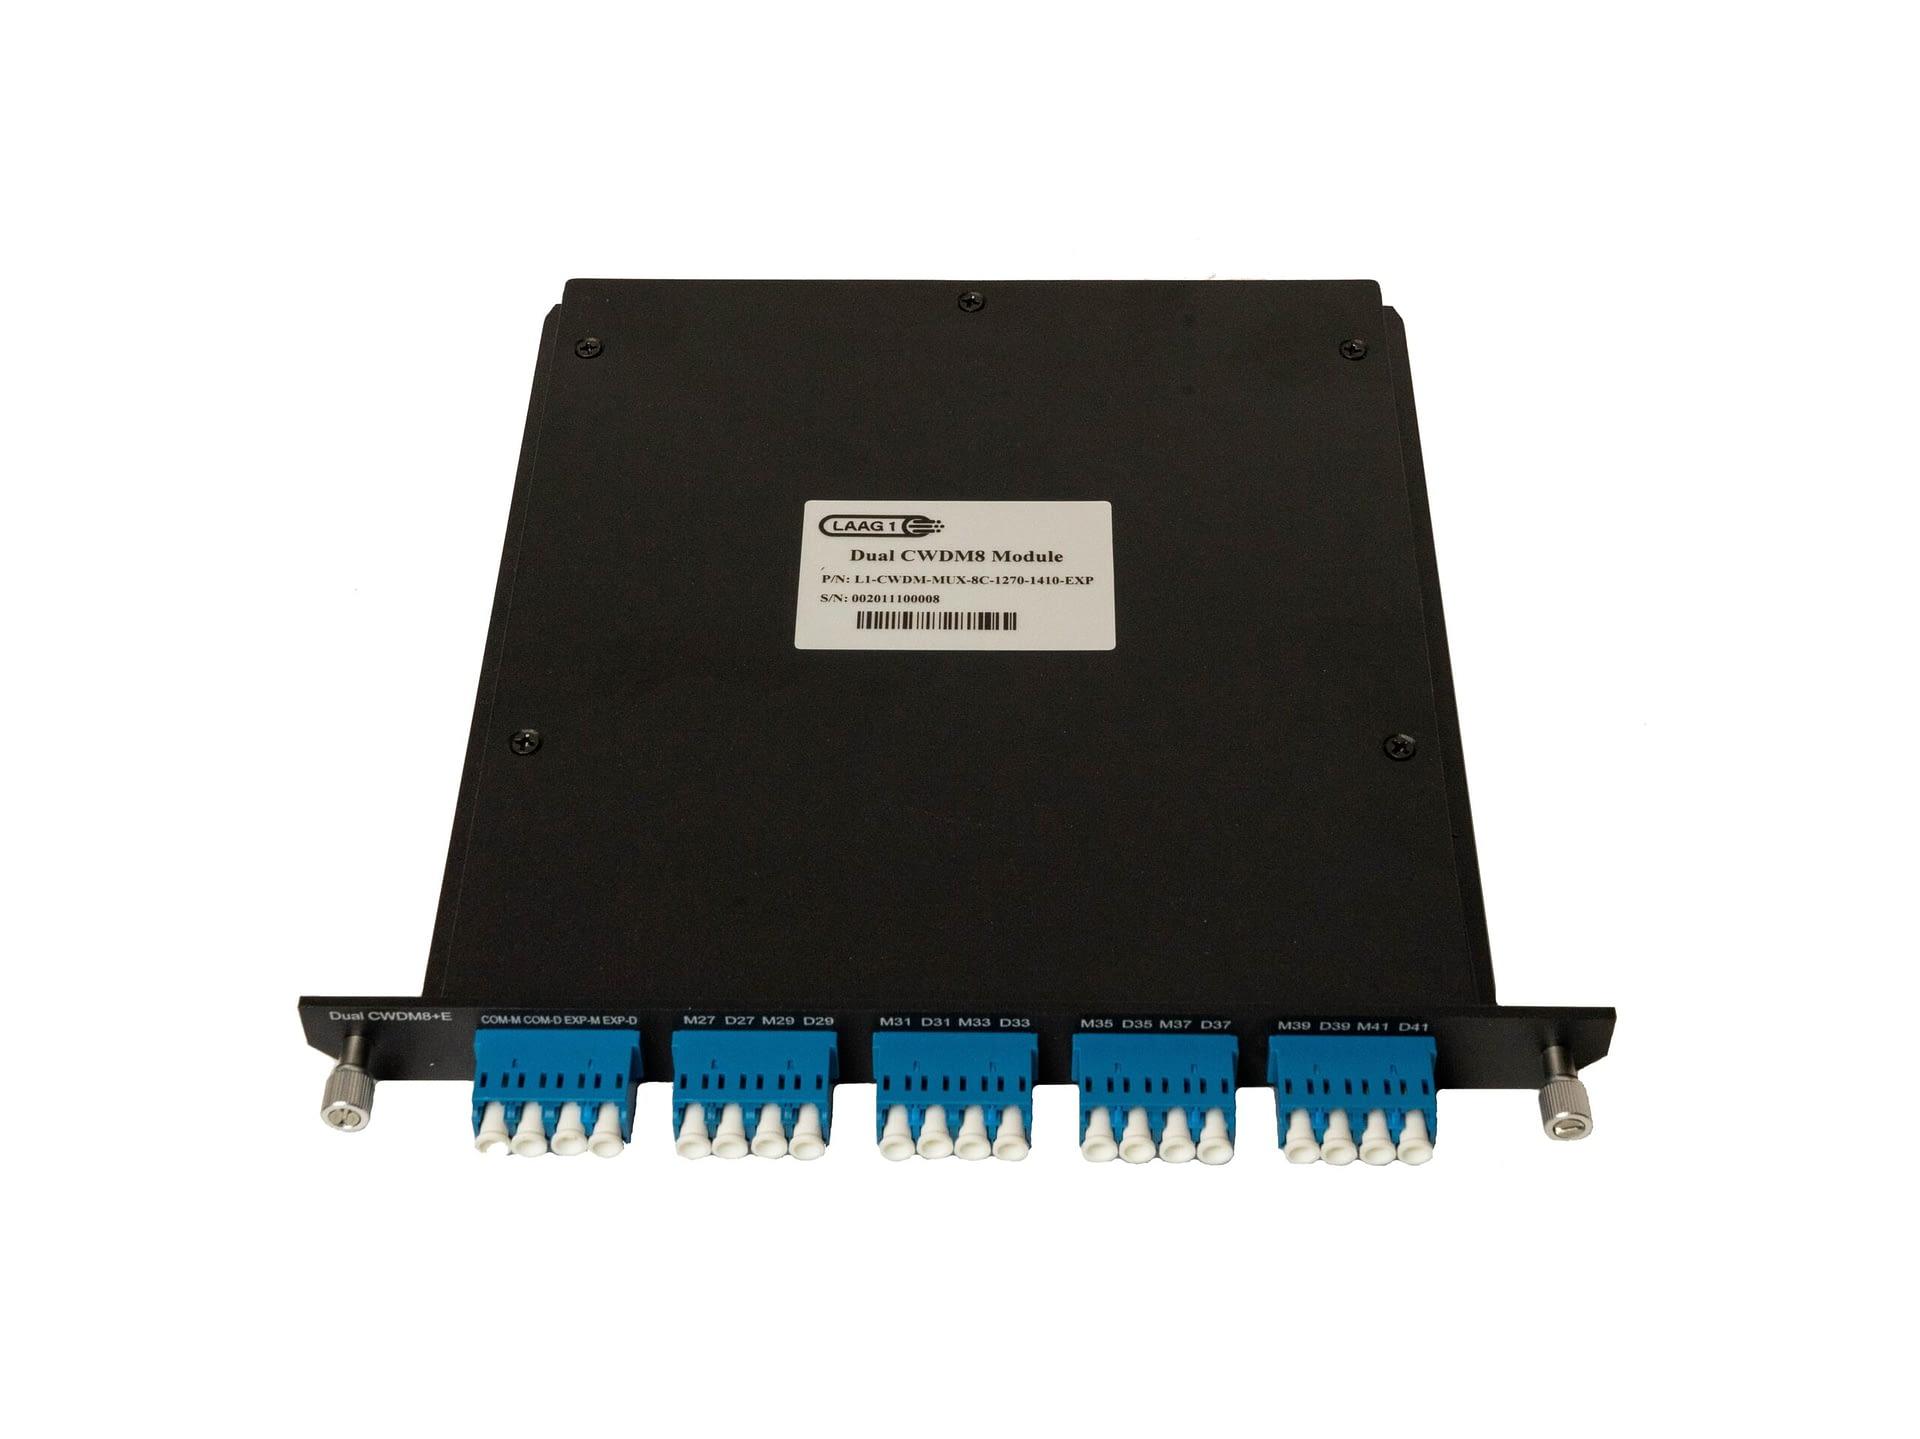 DWDM Mux 40 kanalen van CC21-C60, 3.5dB dempingLC/UPC Monitor Expansie poort